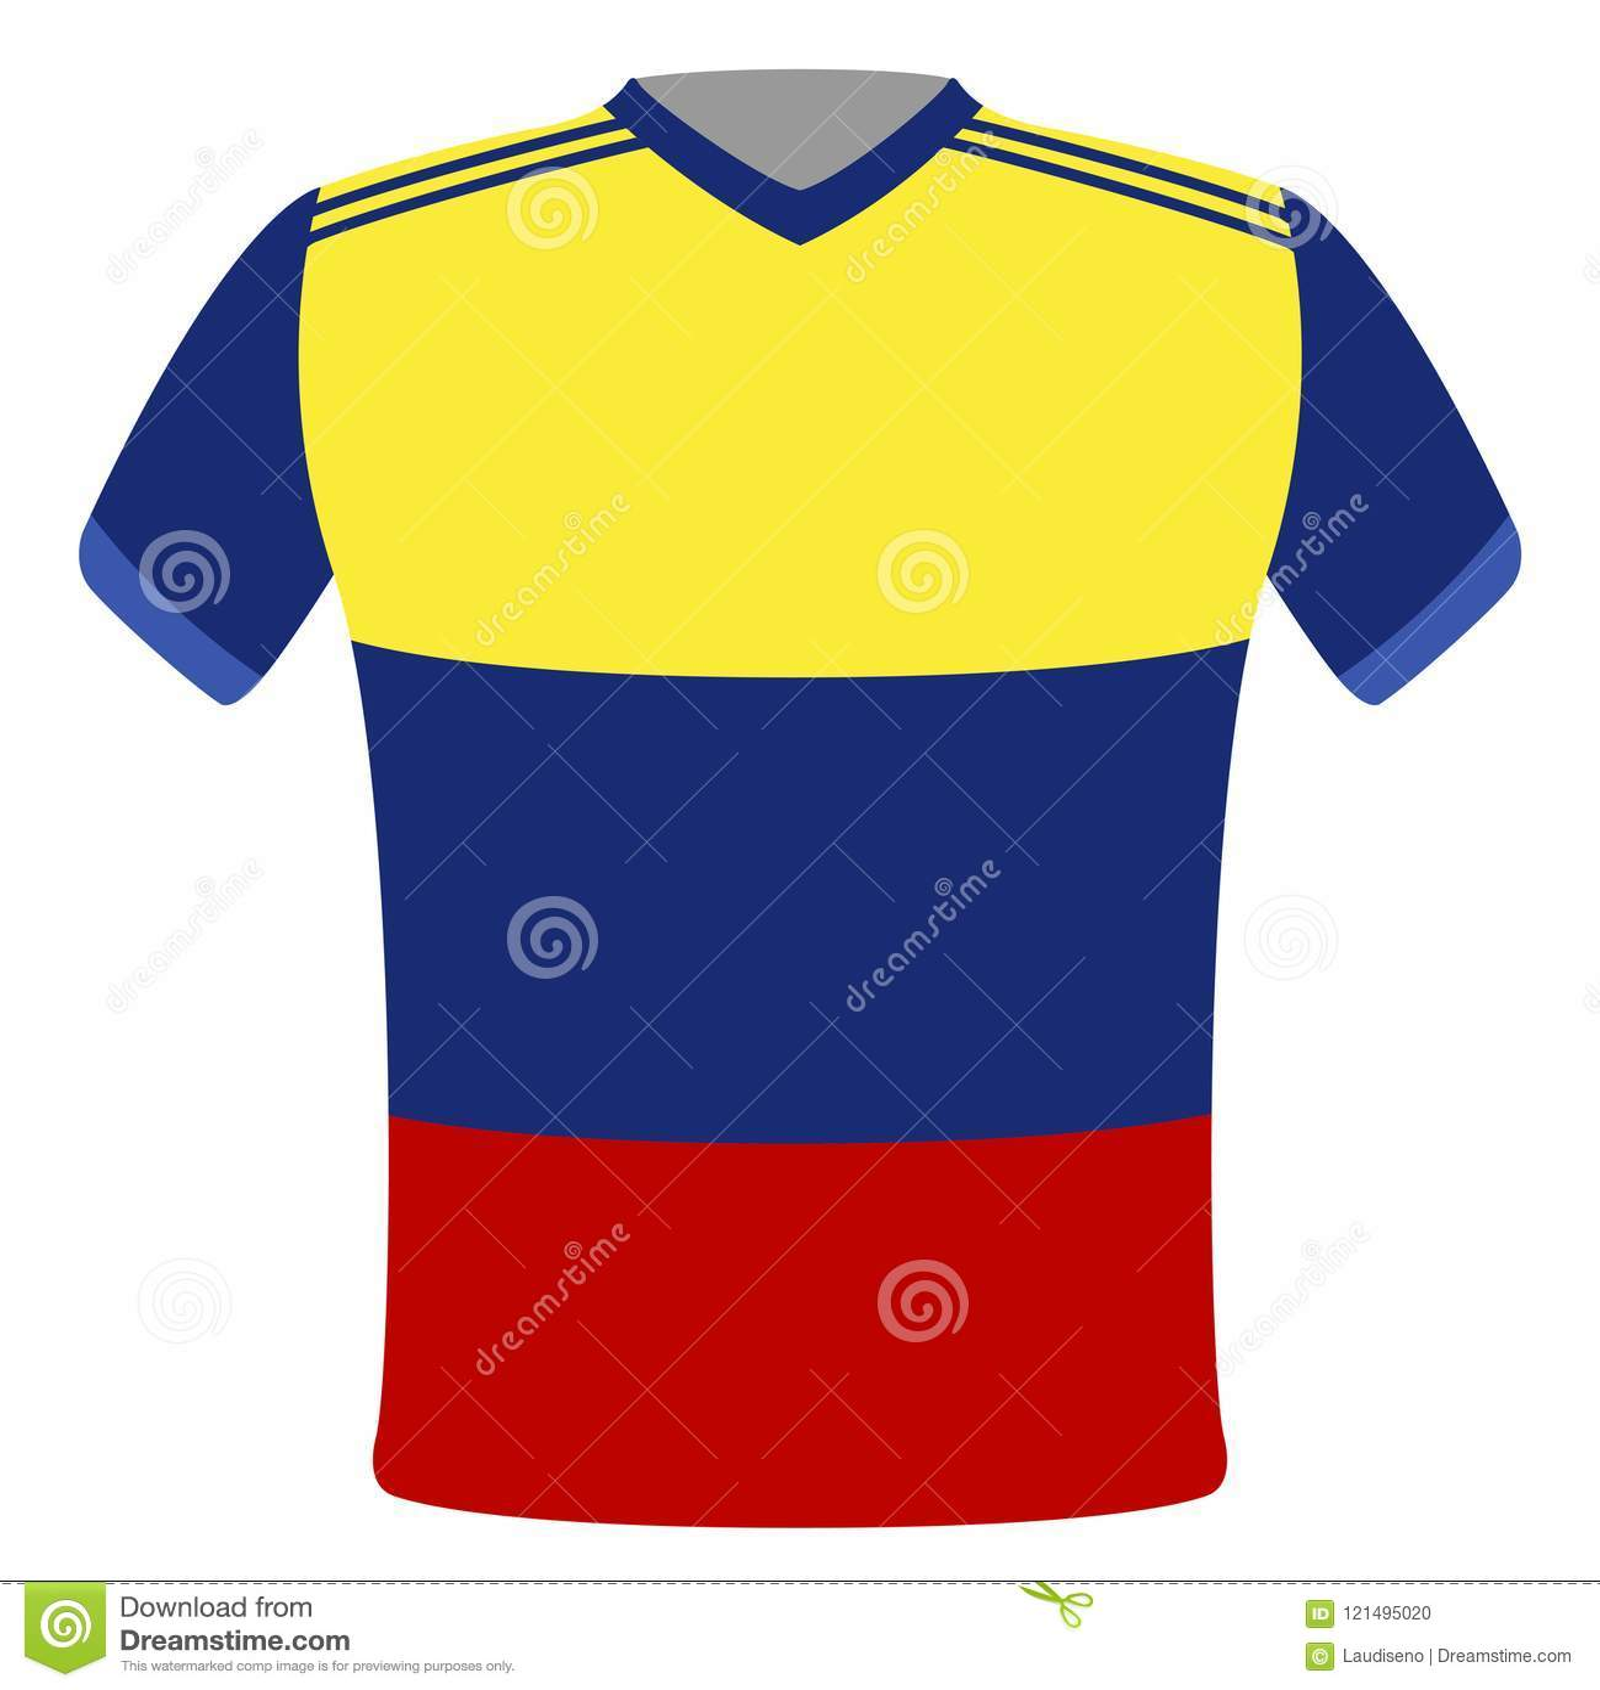 9dacbb4b708 Flag t-shirt of Ecuador stock vector. Illustration of ecuador ...